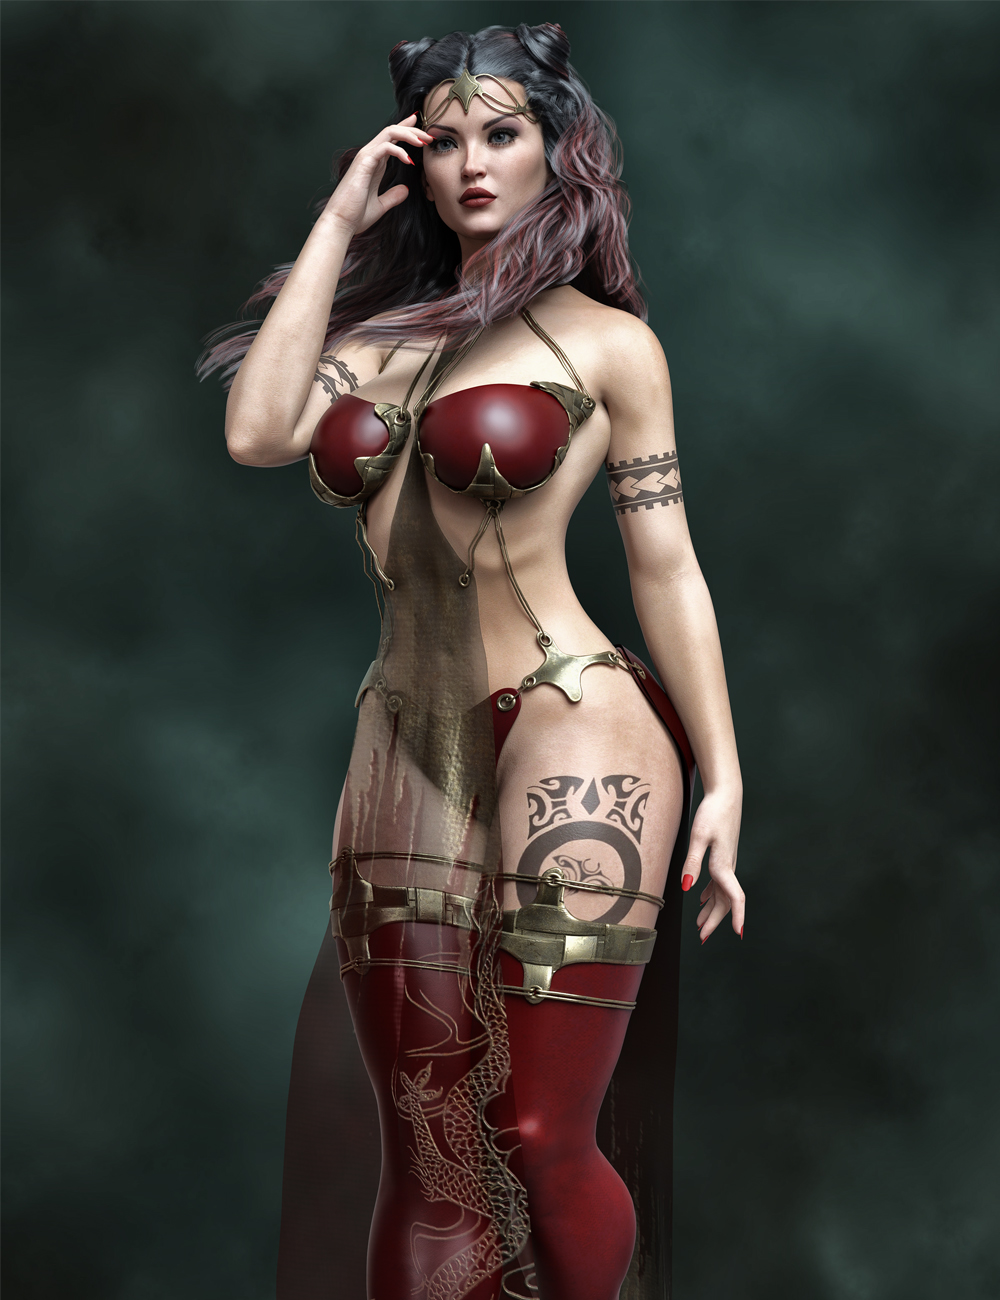 MR Lorayne for Genesis 8.1 Female by: Marcius, 3D Models by Daz 3D